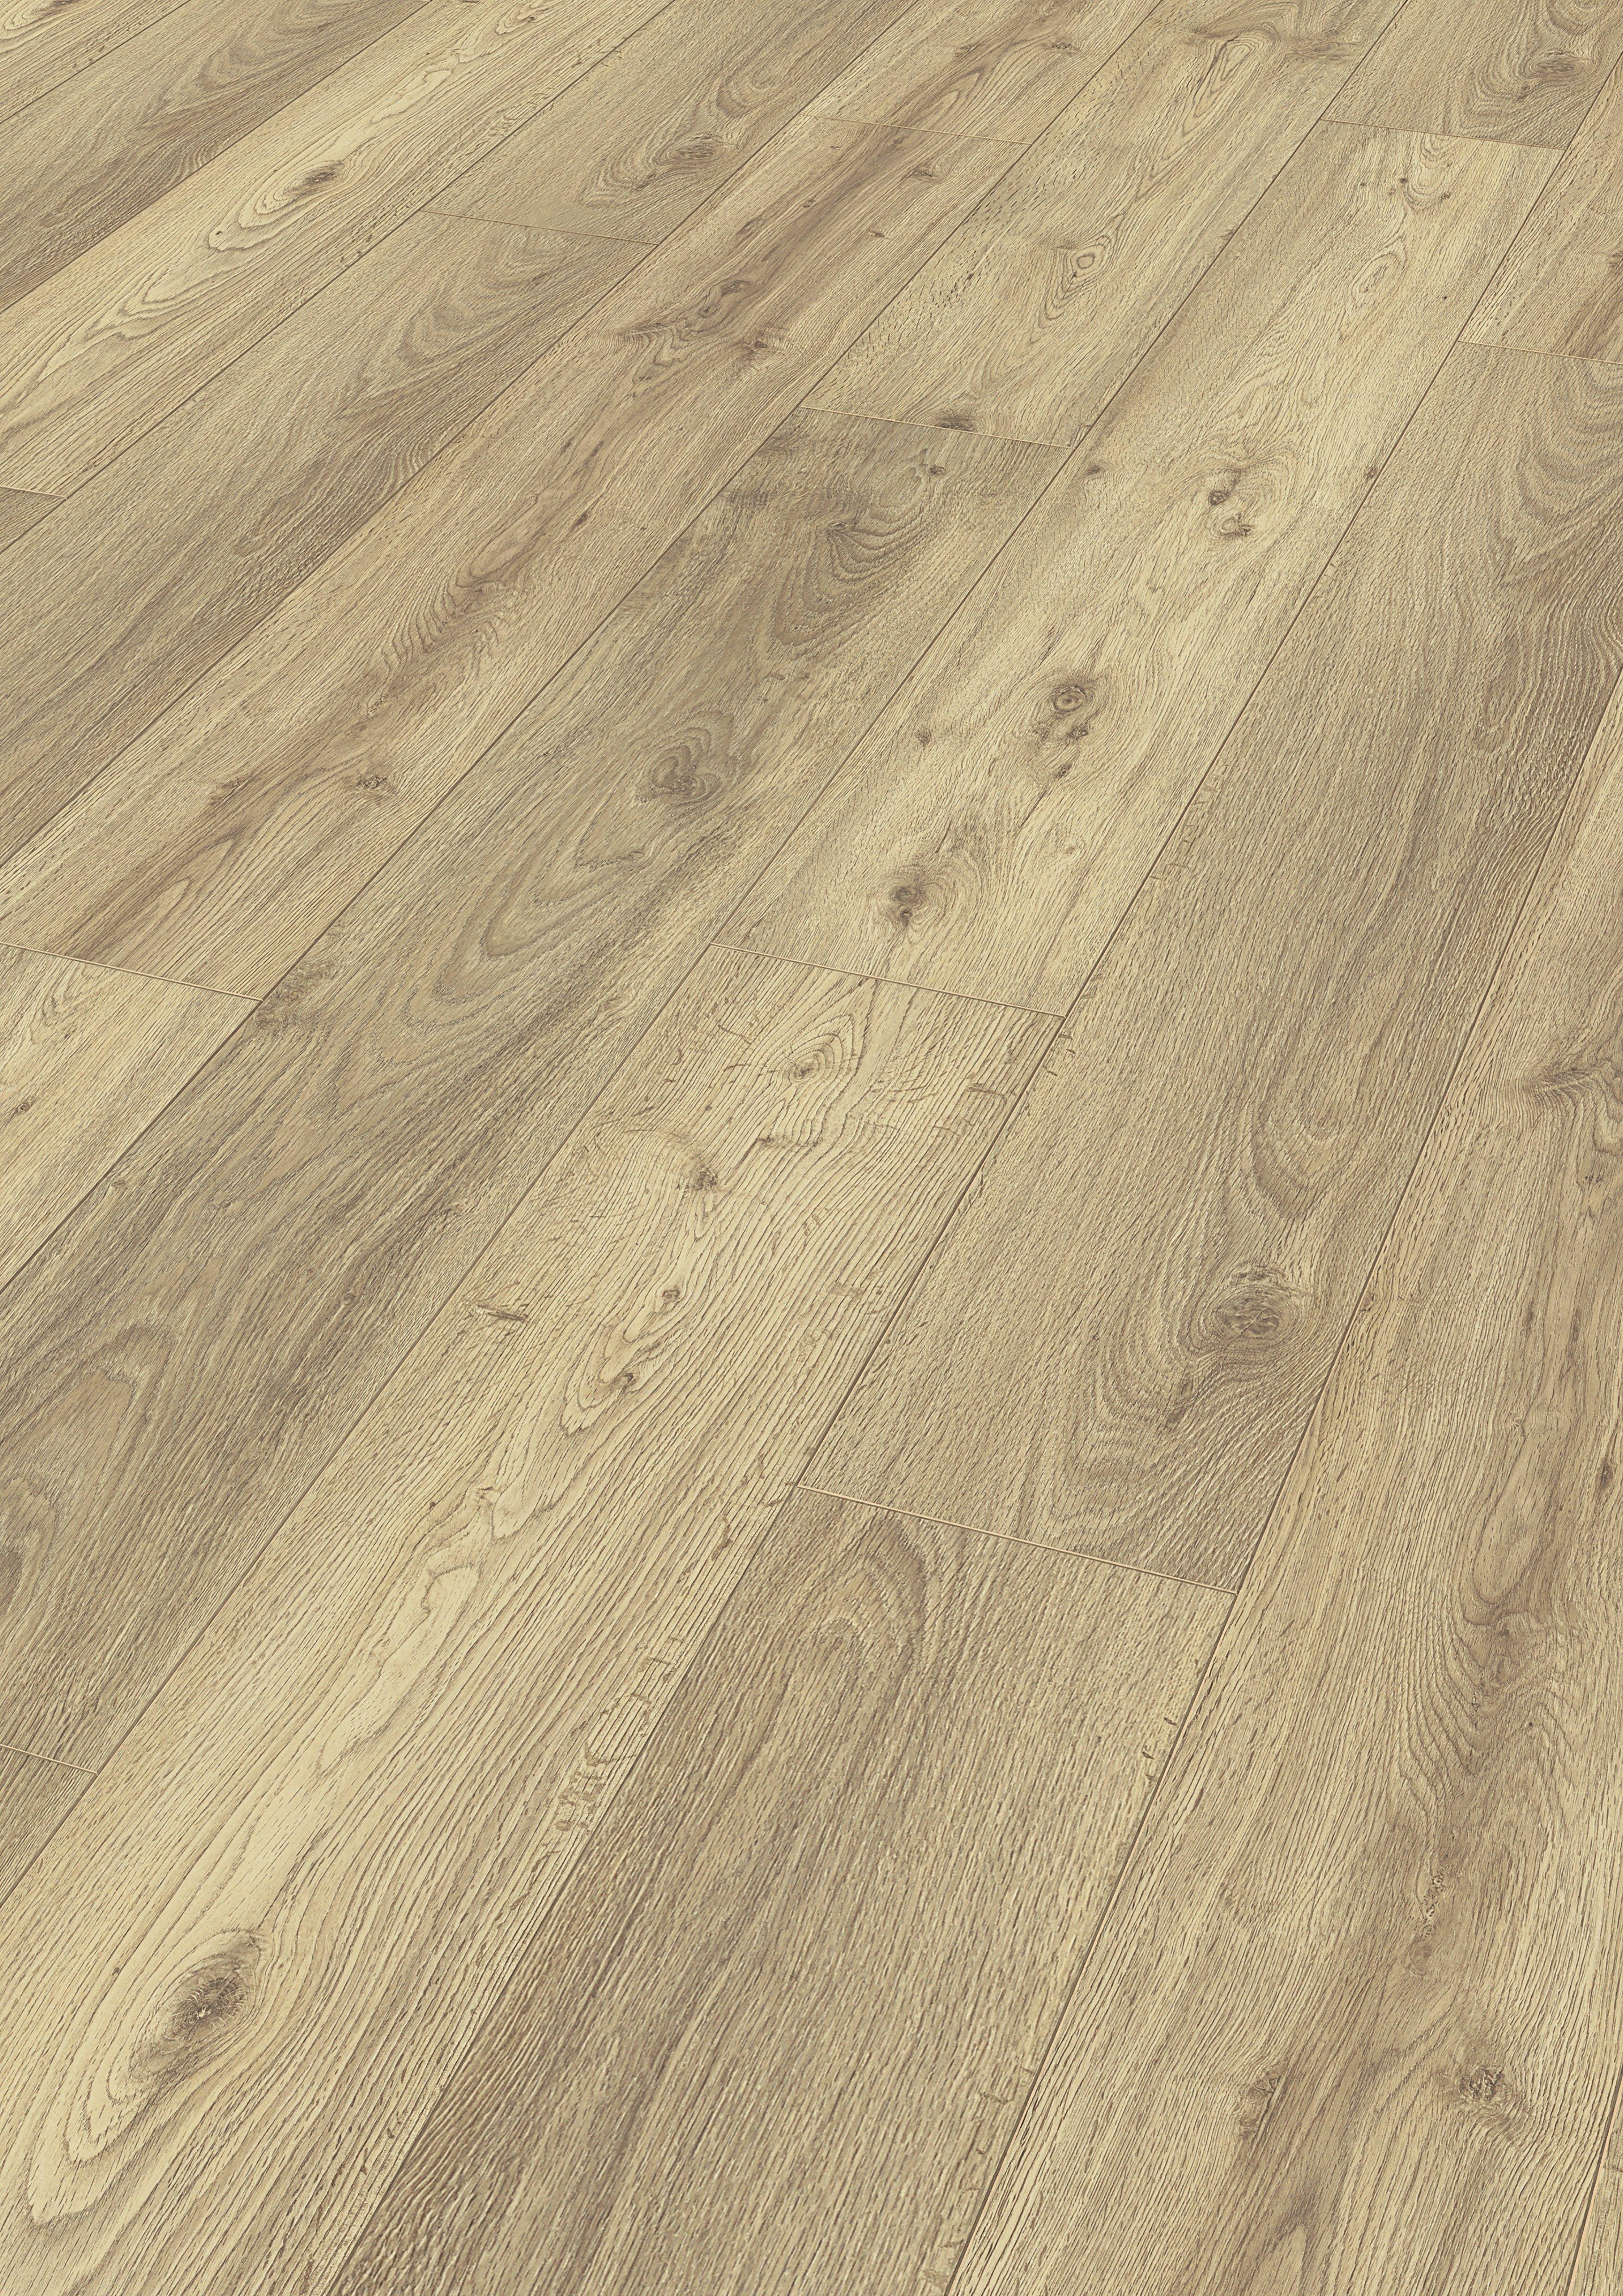 Light Chiemsee Oak L6376 | Wood Finish Matt Structure | Wood Effect